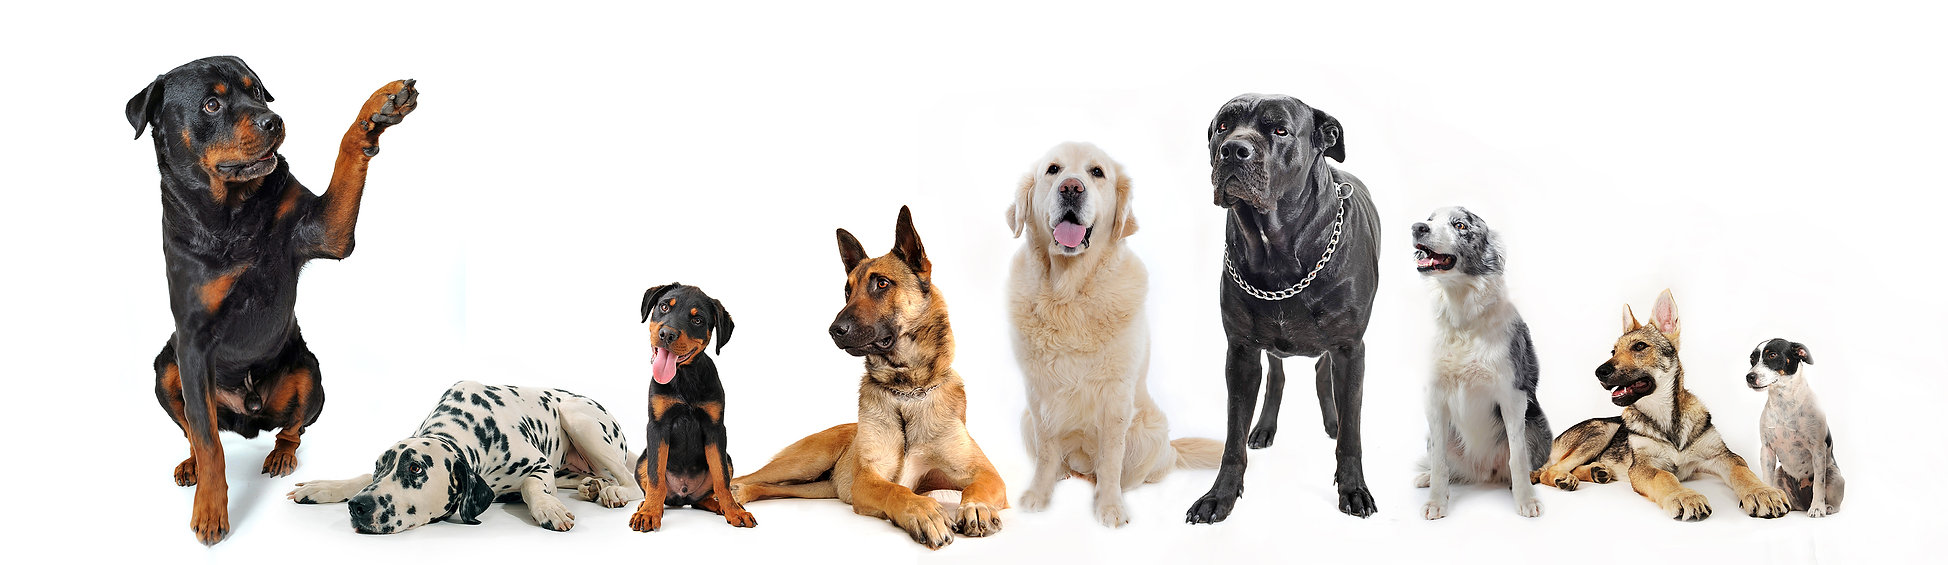 bigstock-group-of-dogs-7620702.jpg